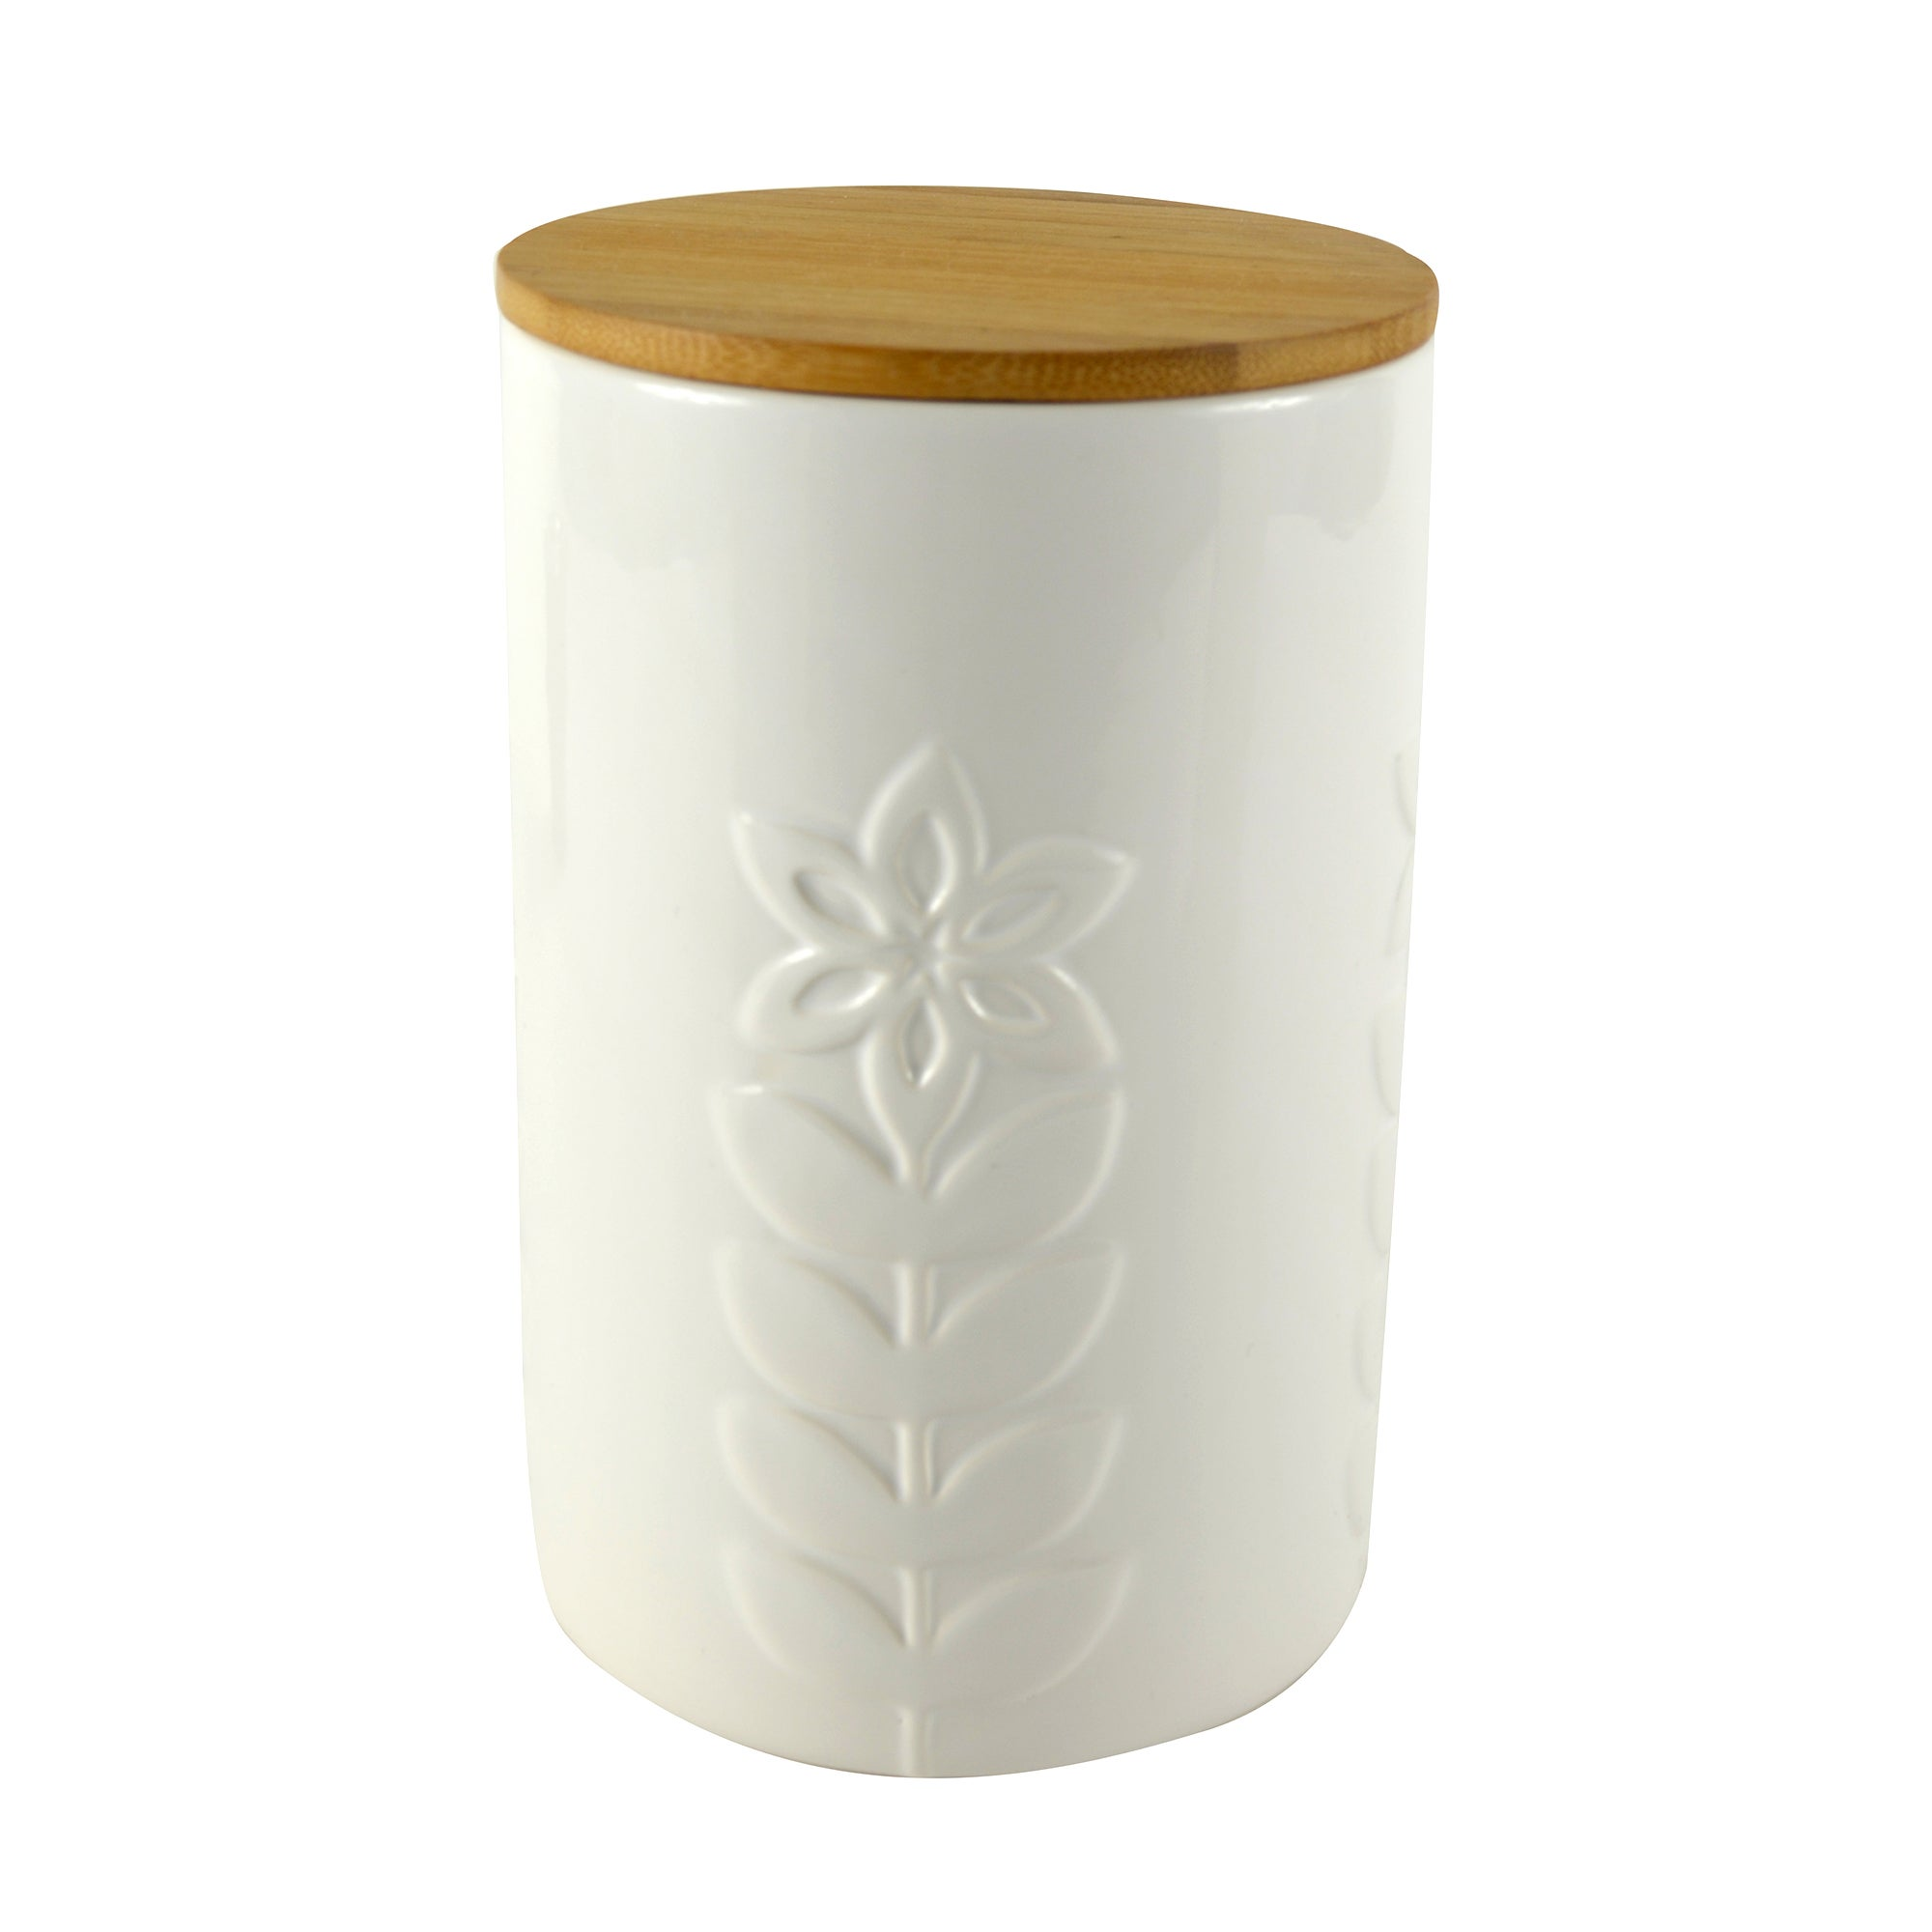 tea coffee sugar storage jar shop for cheap cookware. Black Bedroom Furniture Sets. Home Design Ideas